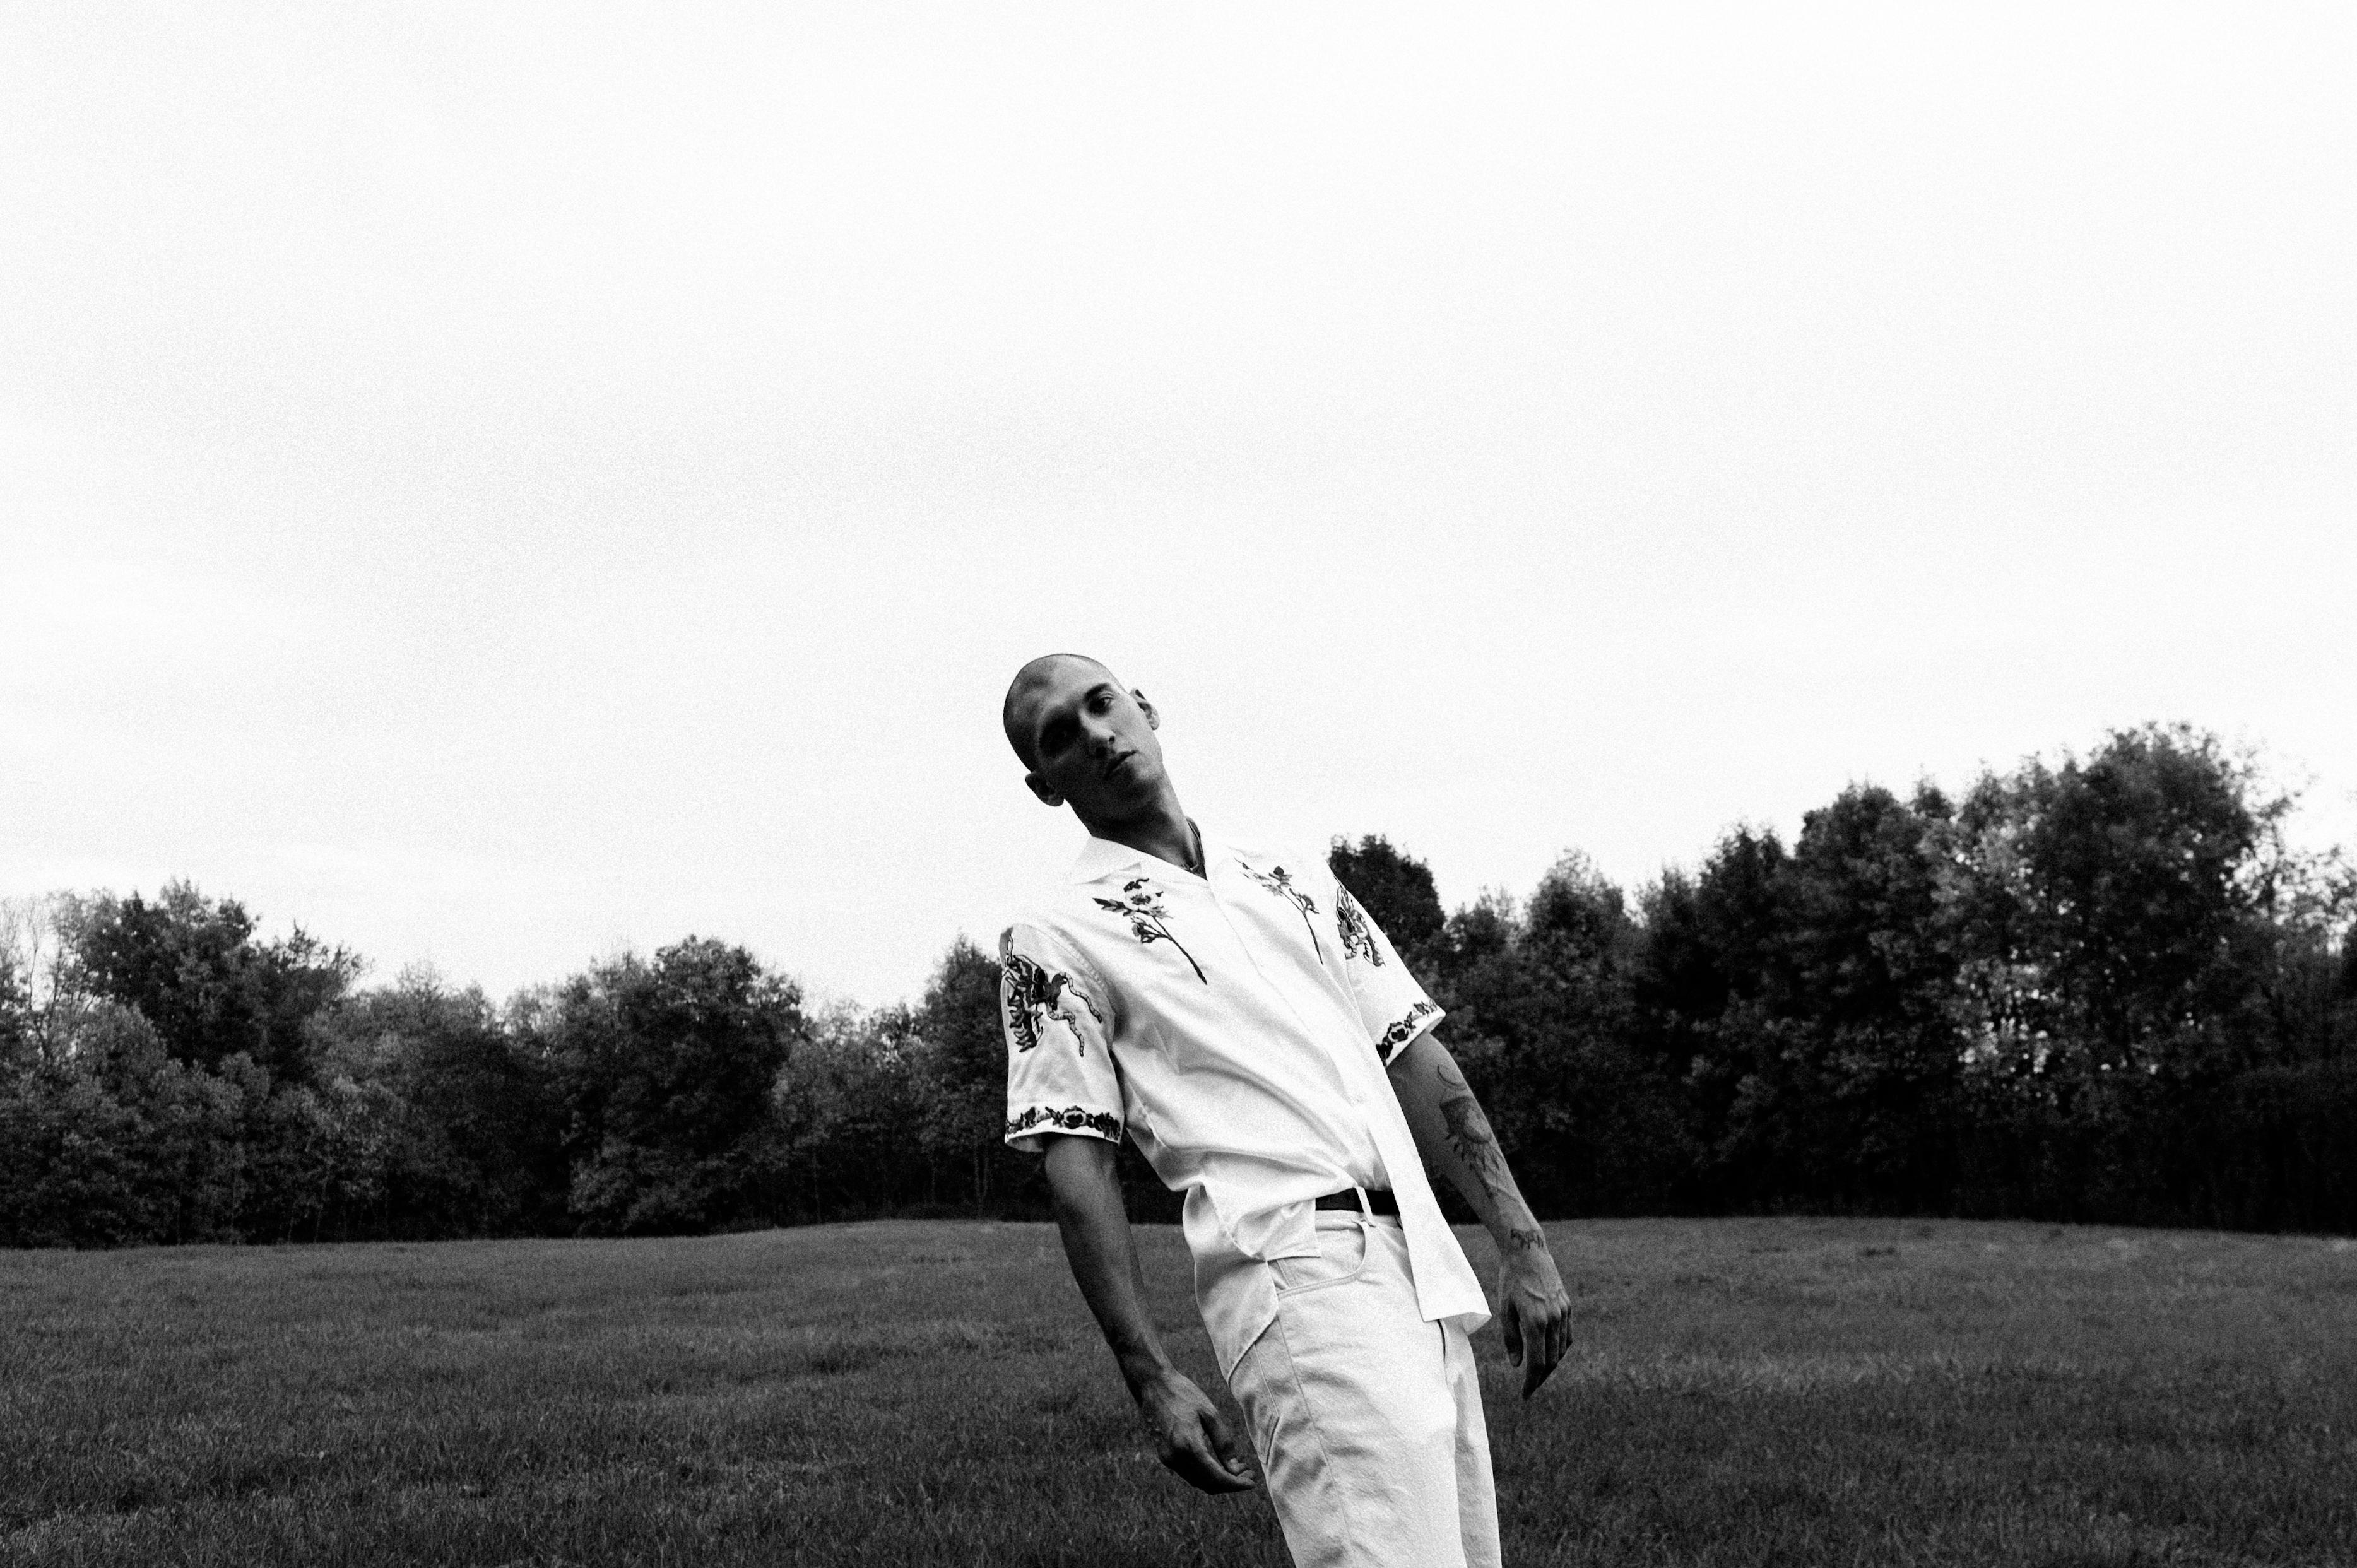 Rymz s'ouvre sur son prochain album, qui sortira le 17